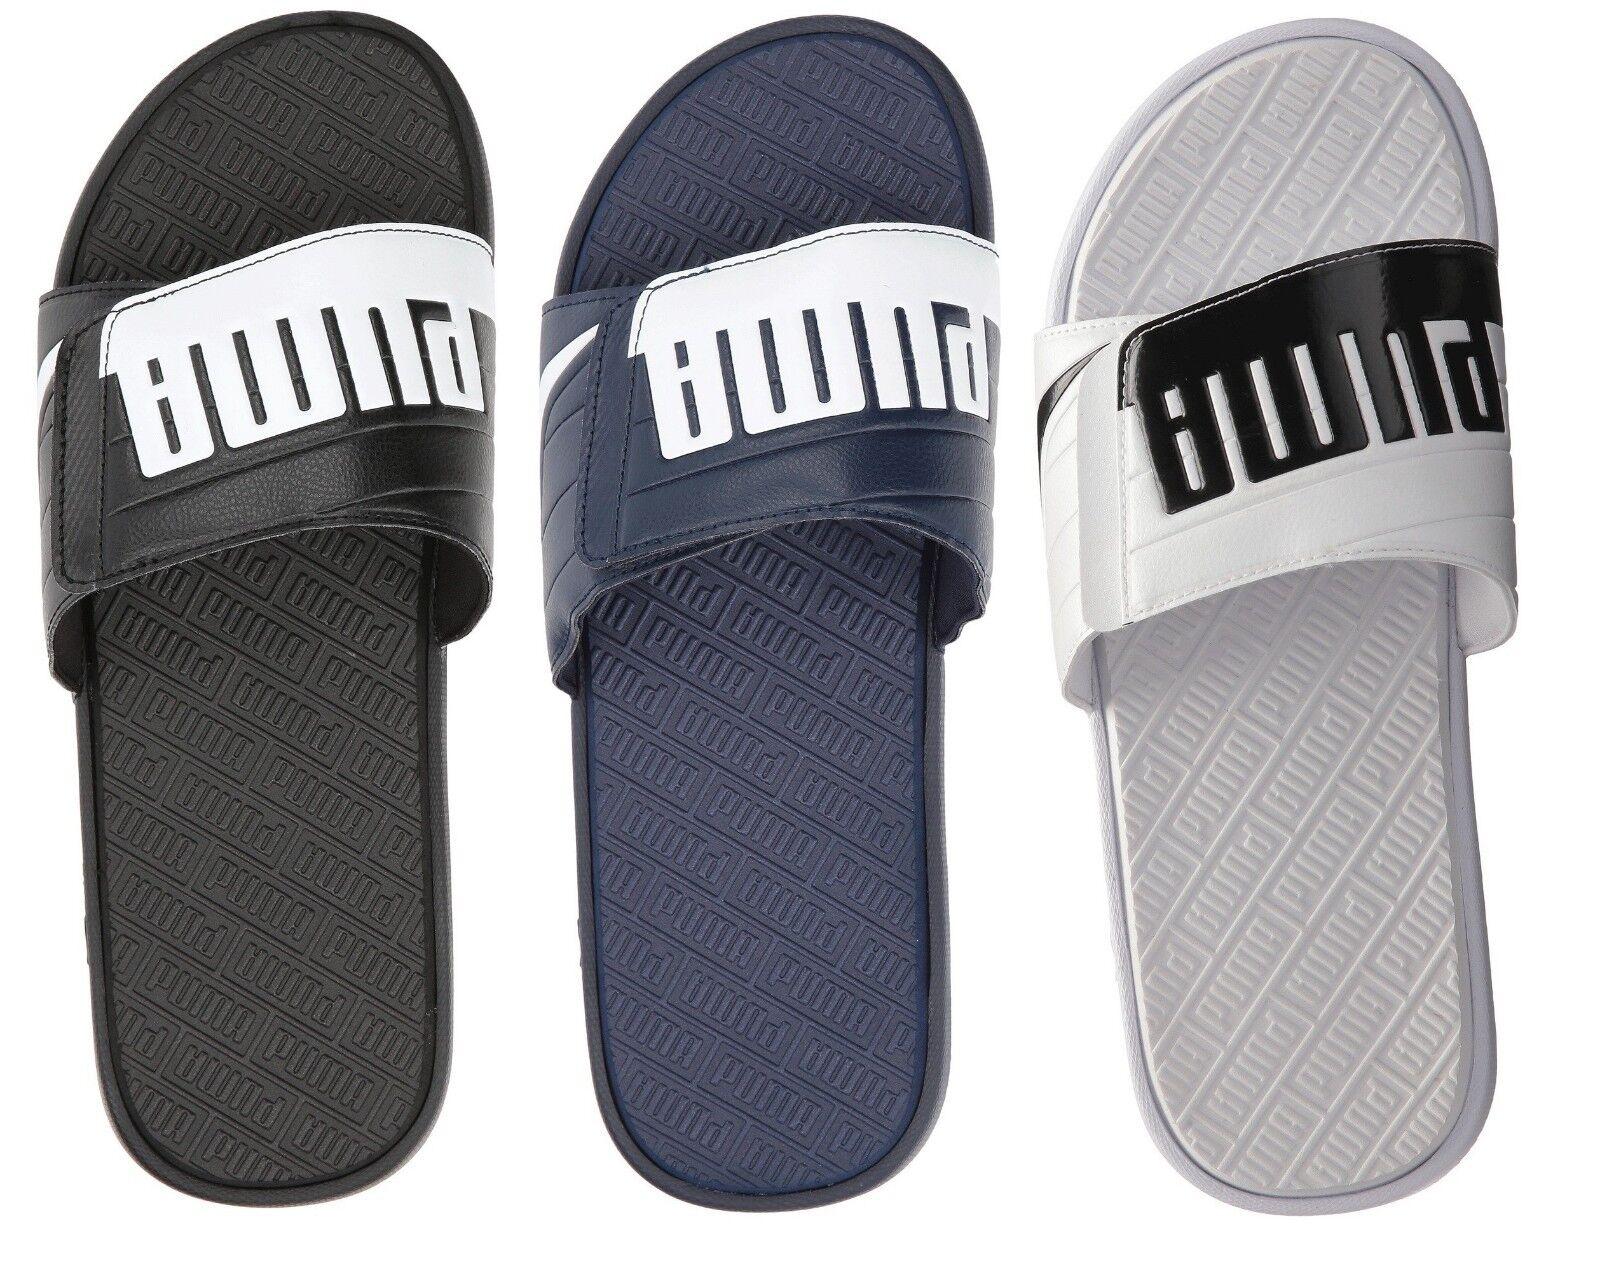 NEW Puma Men's Fashion shoes Starcat Bold Plus Slip On Slide Sandals Many colors